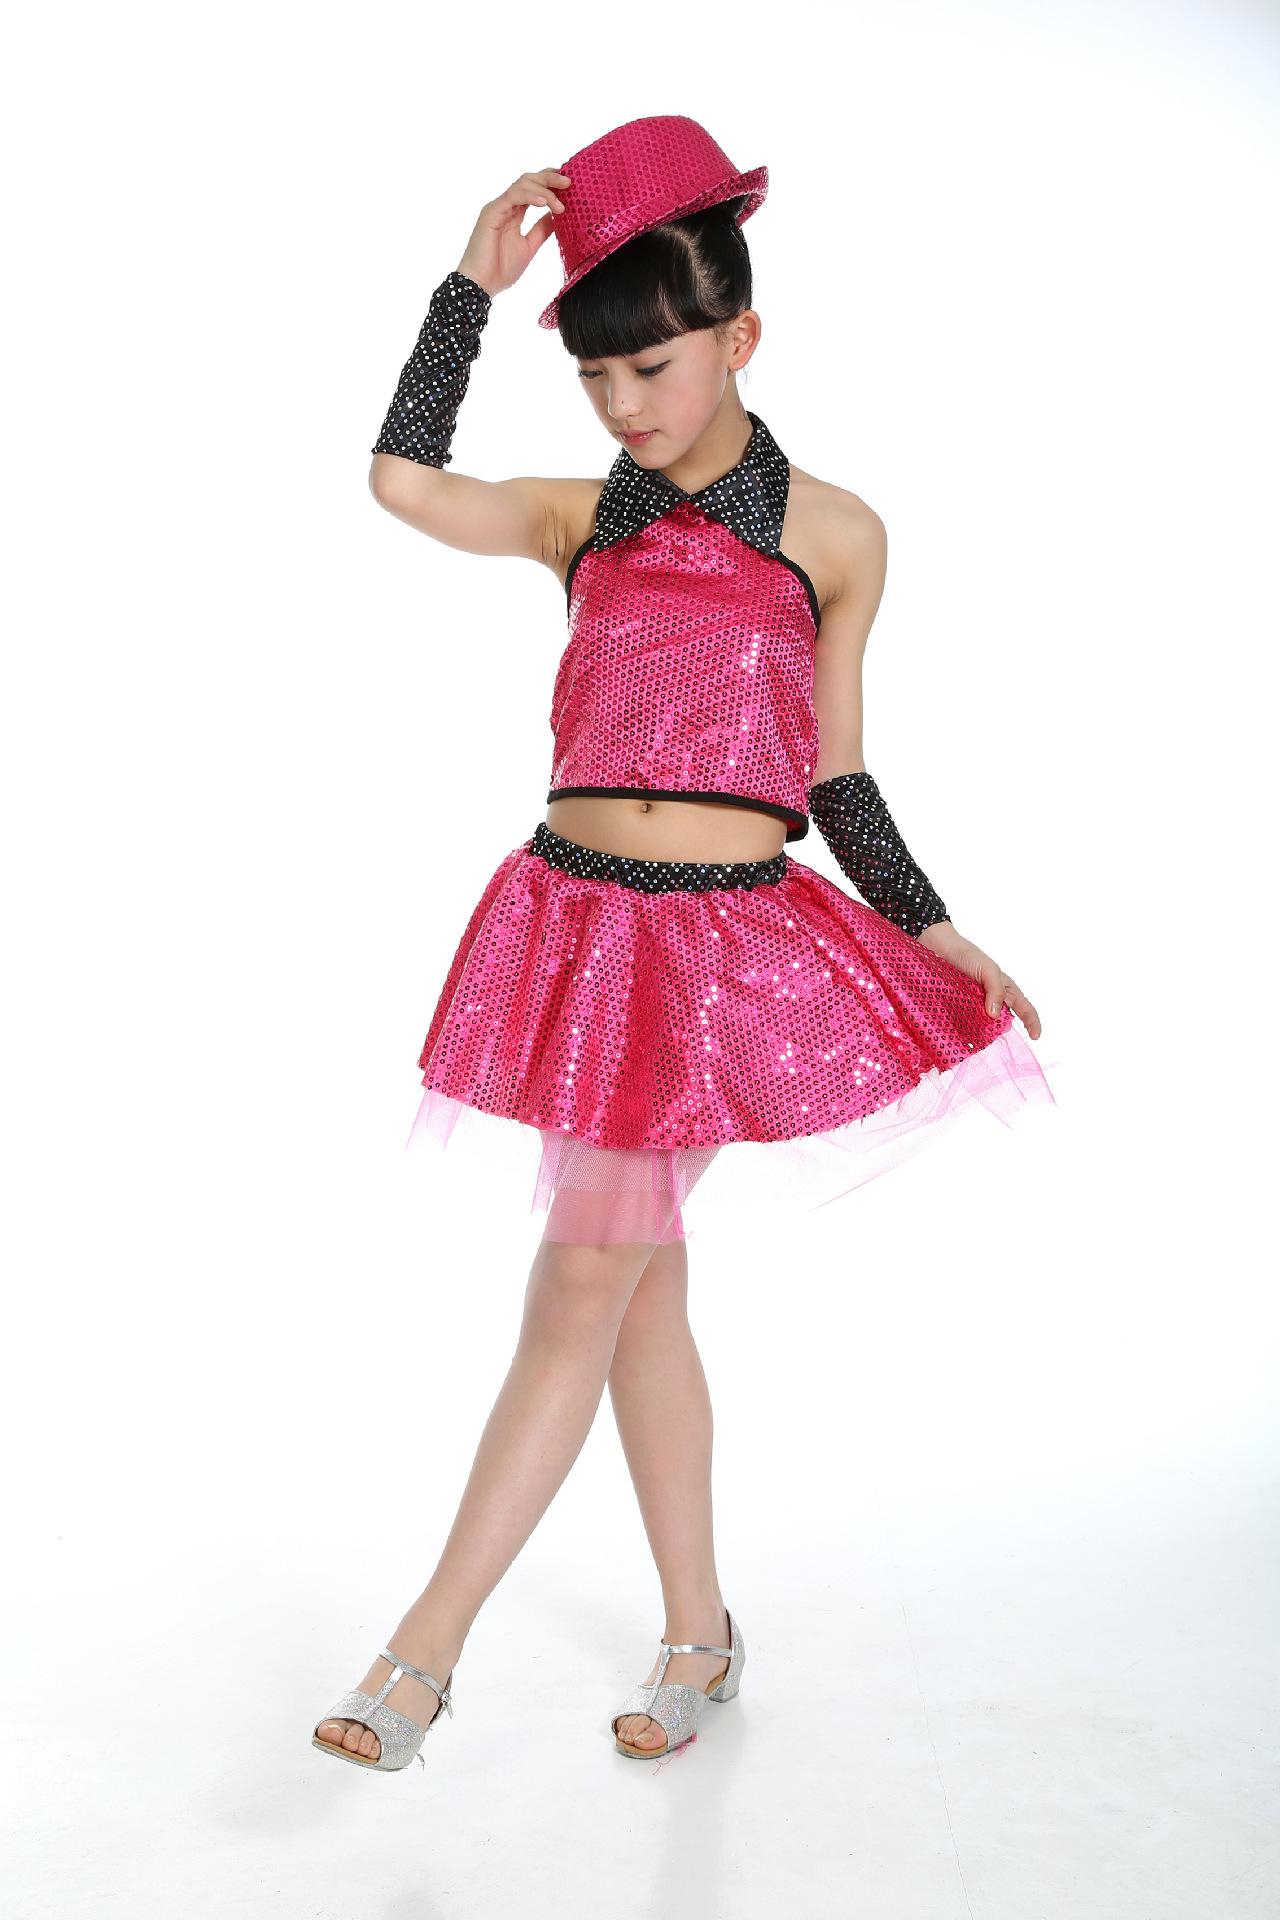 Top+skirt+sleevlet Children Jazz Dance Cotumes Sequins Girl Modern Dance Clothing Magician Stage Performance Costume Sets 89